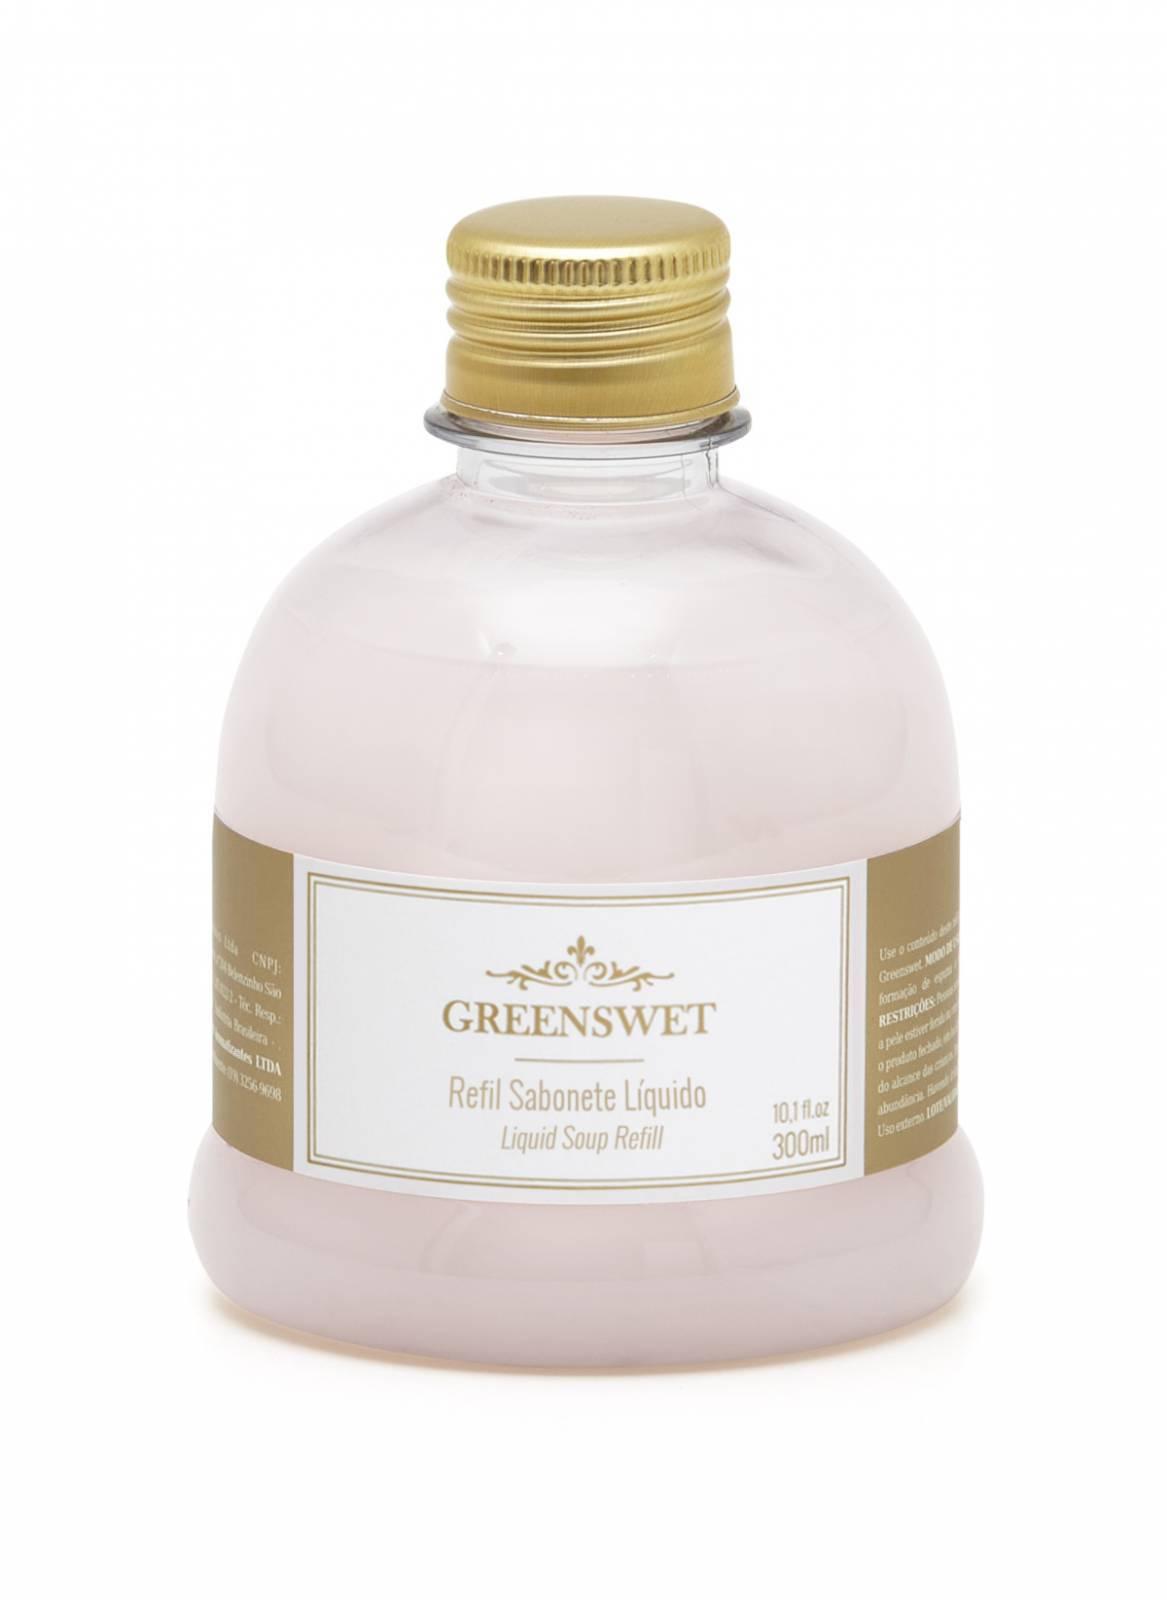 Refil Sabonete Liquido 300 ml Essência Sweet Flower - Greenswet Aromatizantes